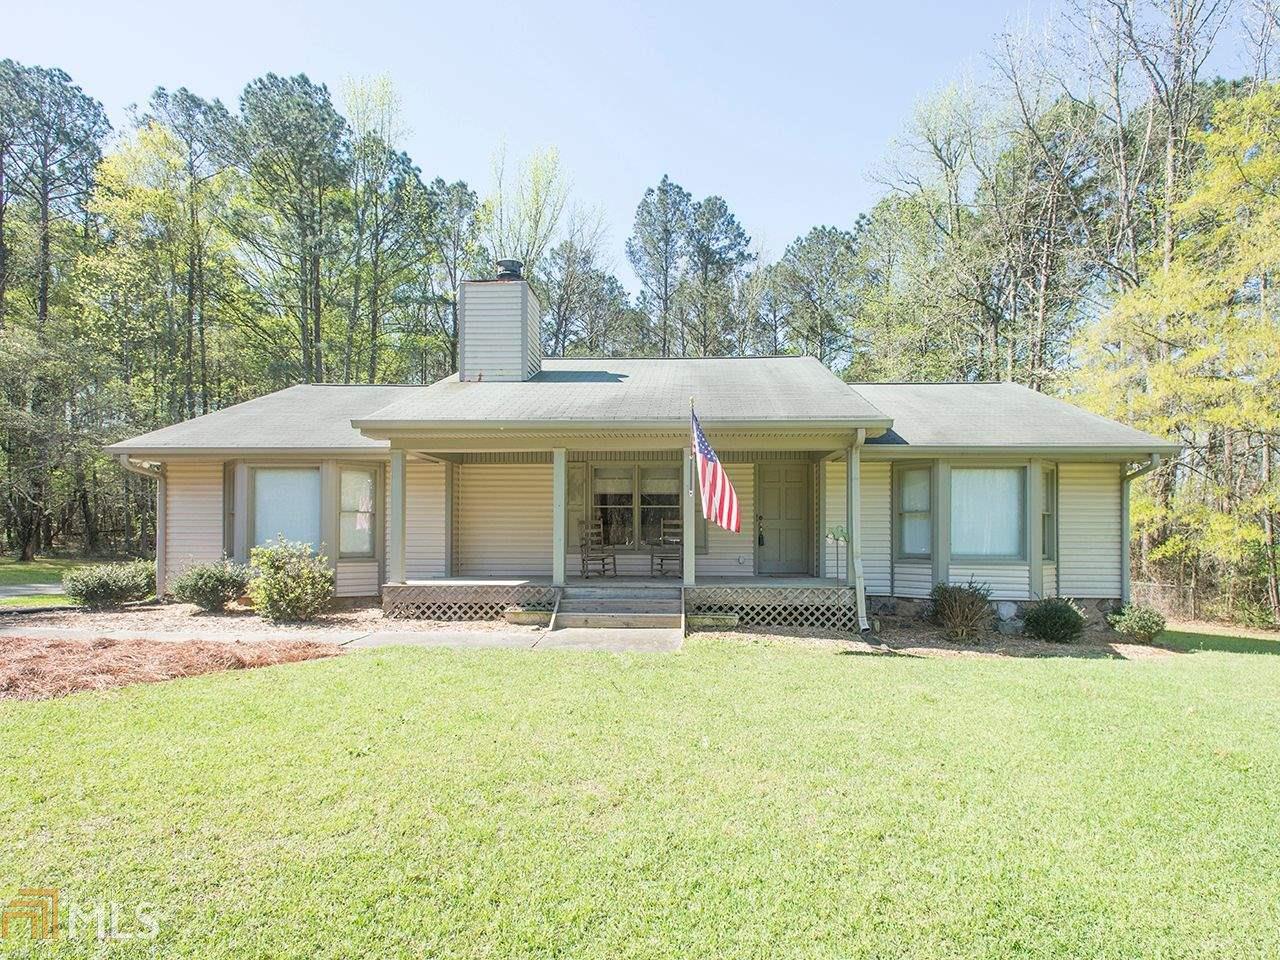 350 Turner Rd, McDonough, Georgia 30252, 3 Bedrooms Bedrooms, ,2 BathroomsBathrooms,Single Family,For Sale,350 Turner Rd,1,8953663